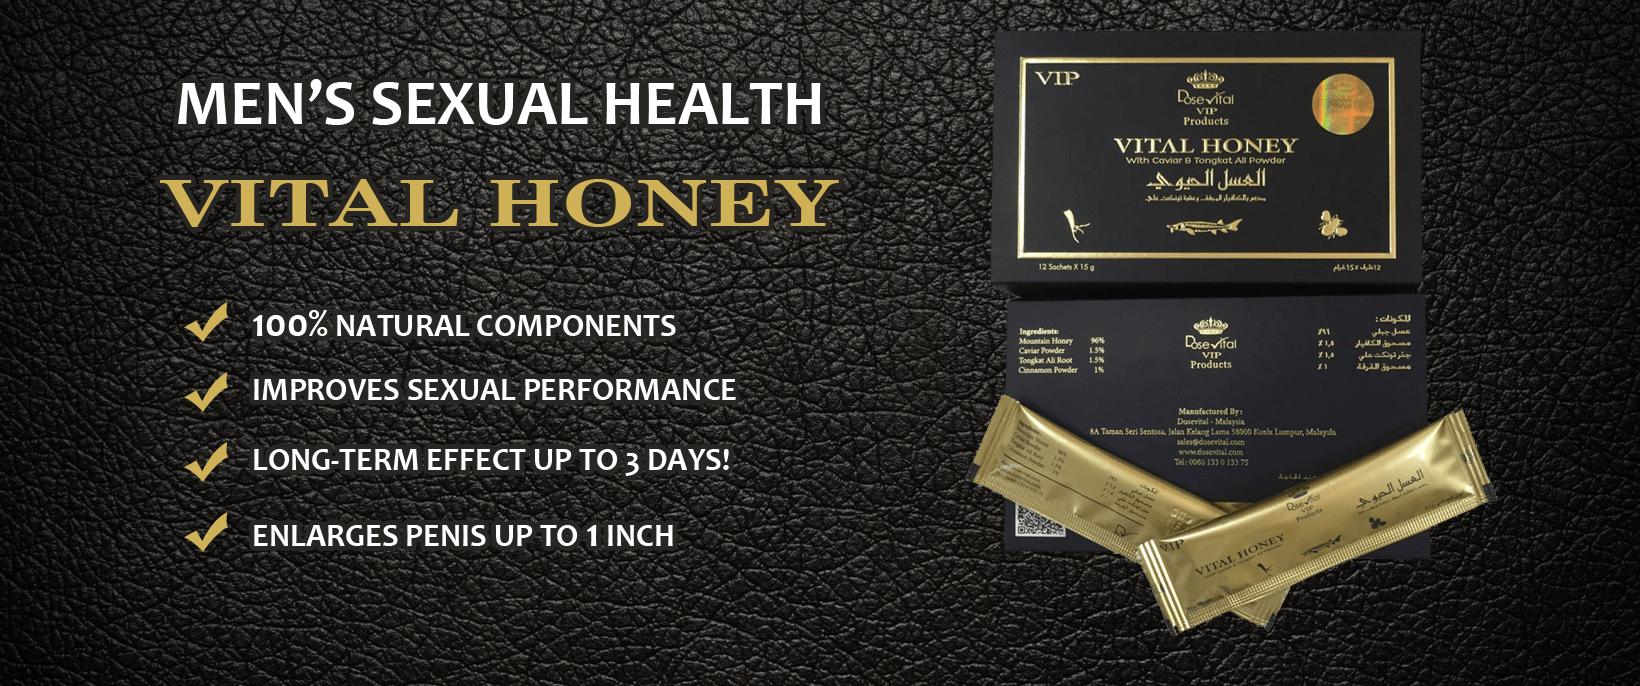 VITAL HONEY - Original Vital Honey men's sexual health product